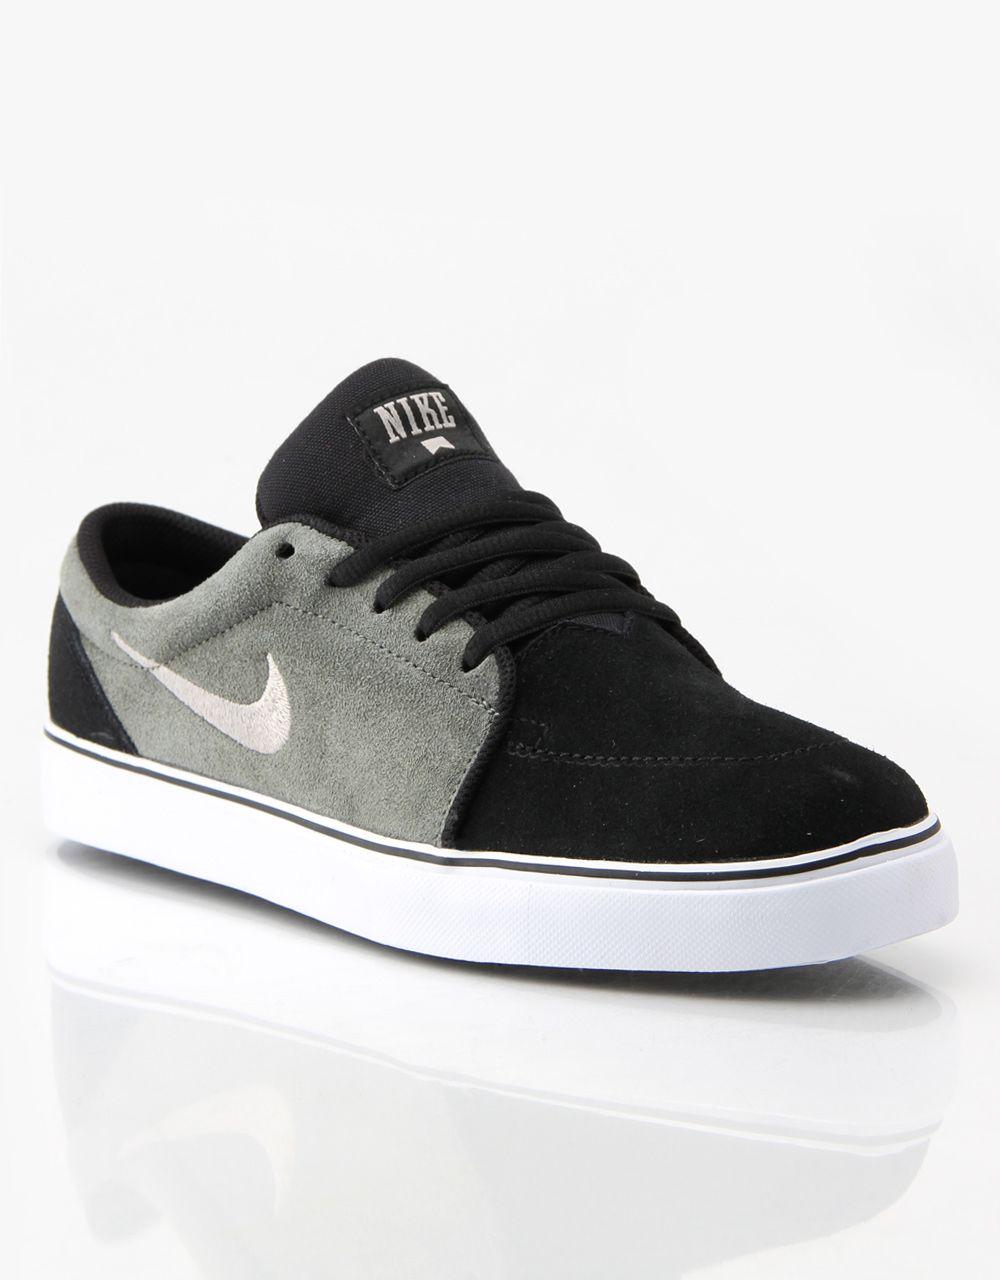 Skate shoes nike - Nike Sb Satire Skate Shoes Mercury Grey